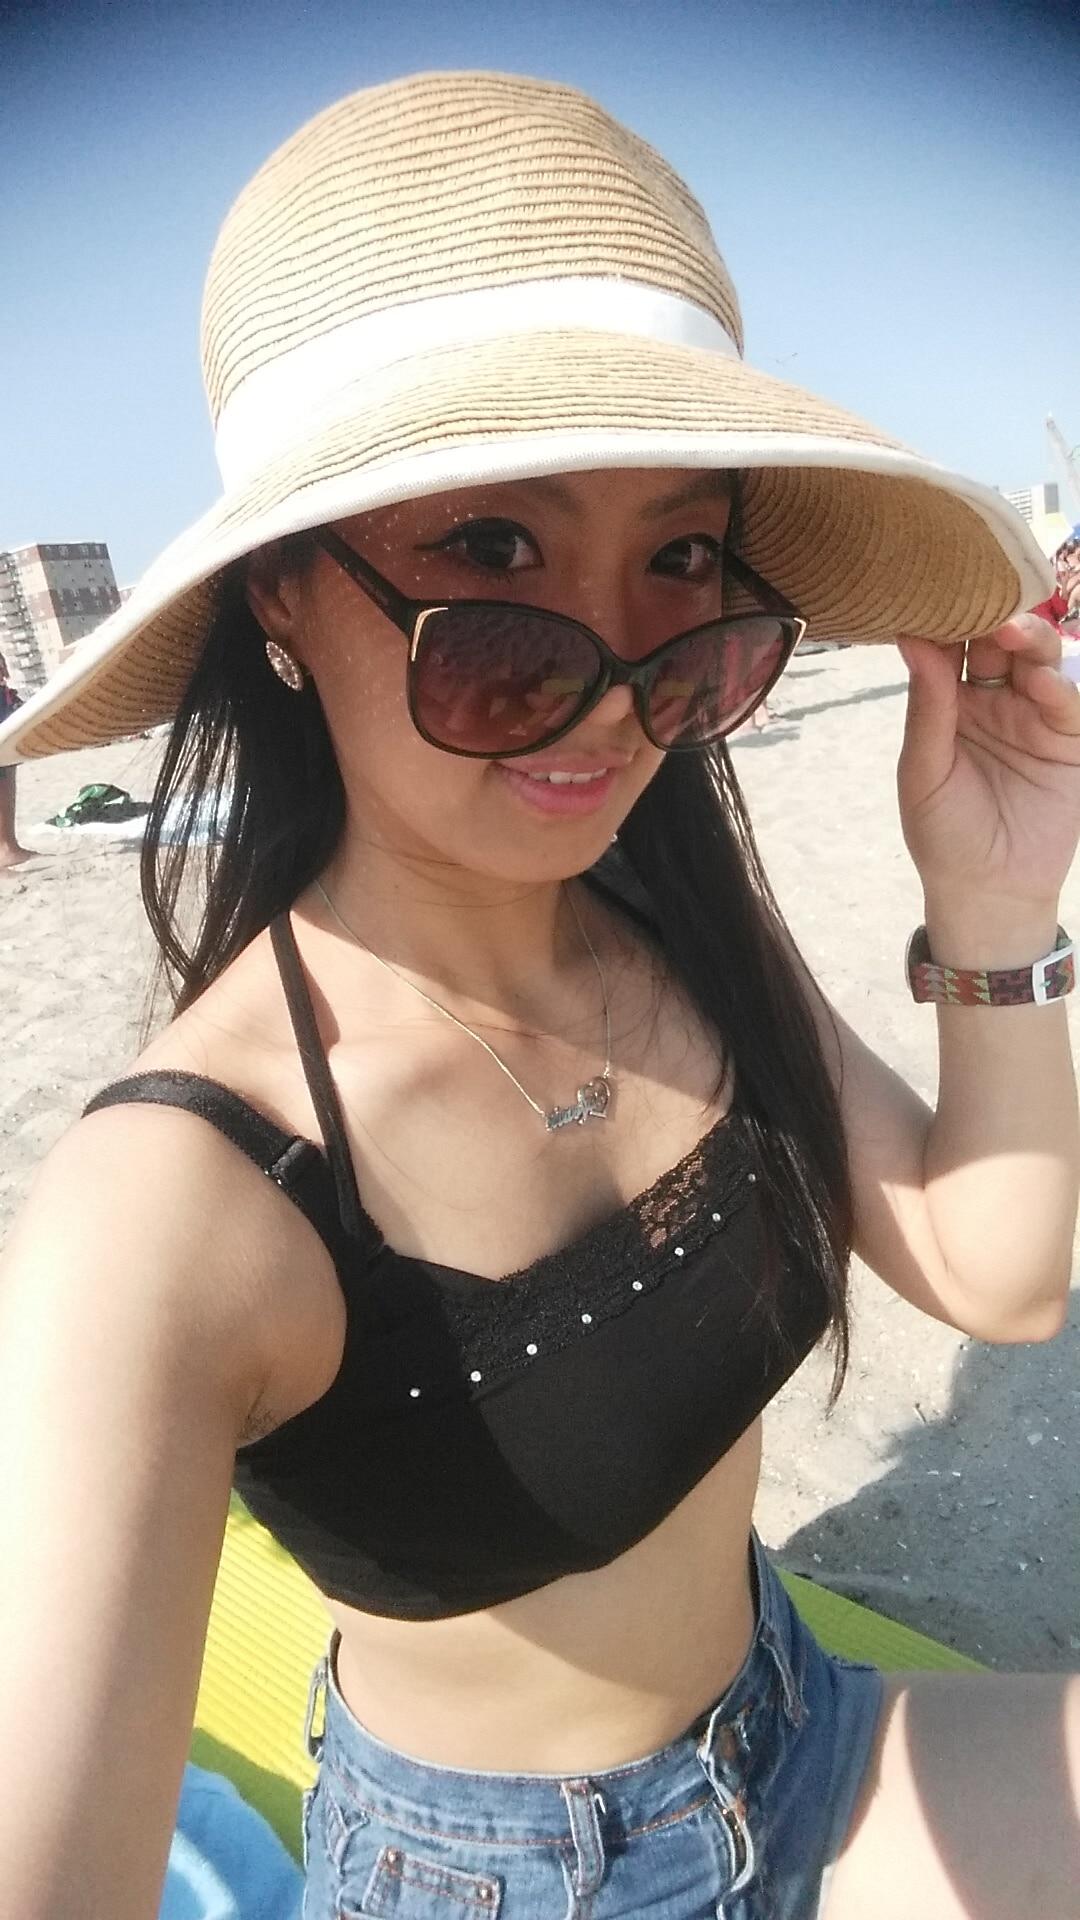 Xiaoyan from Astoria